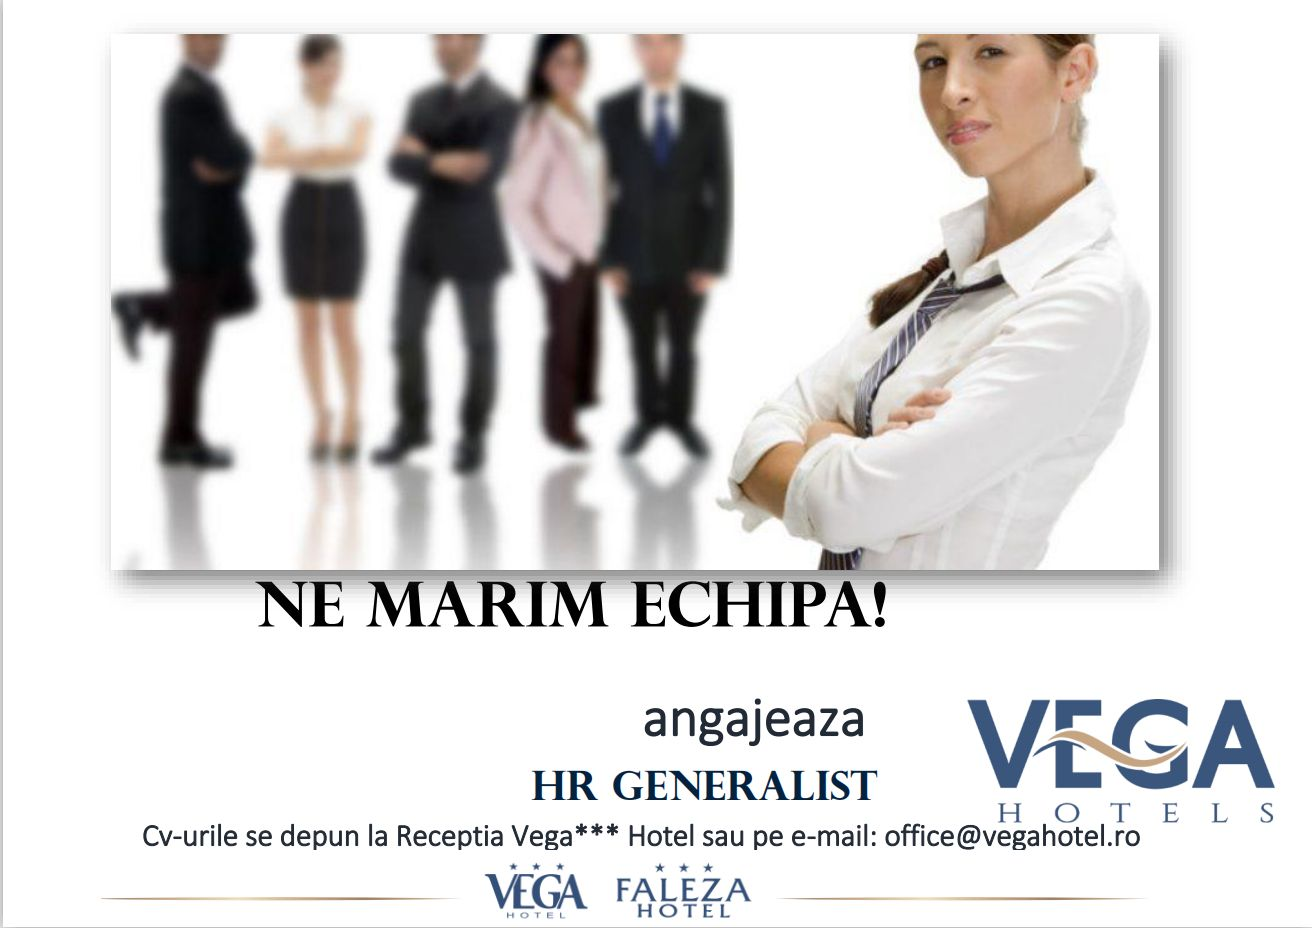 Hotel Vega din Mamaia angajeaza HR Generalist